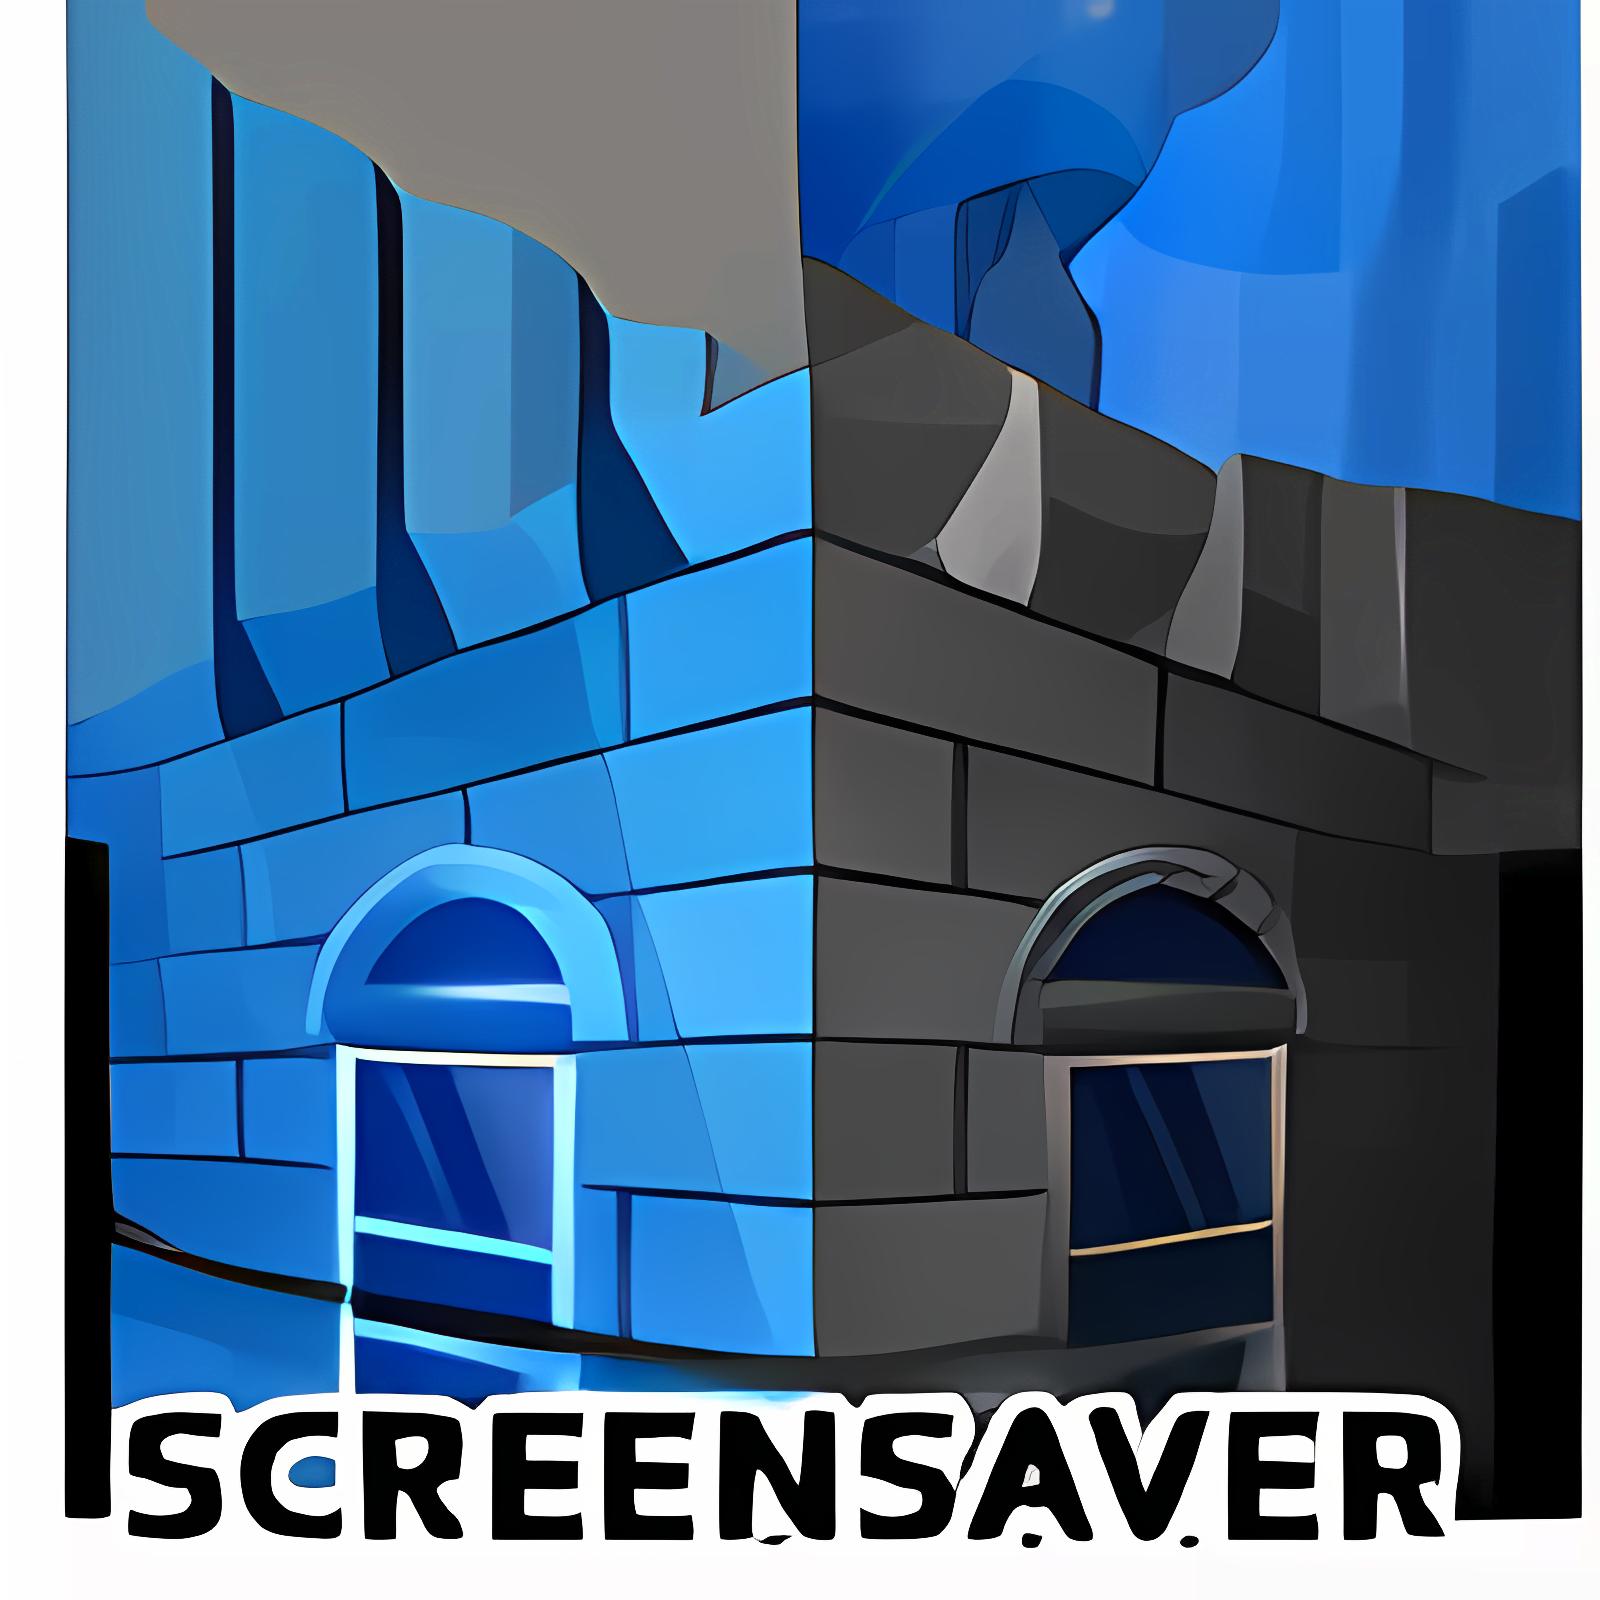 Security Screensaver